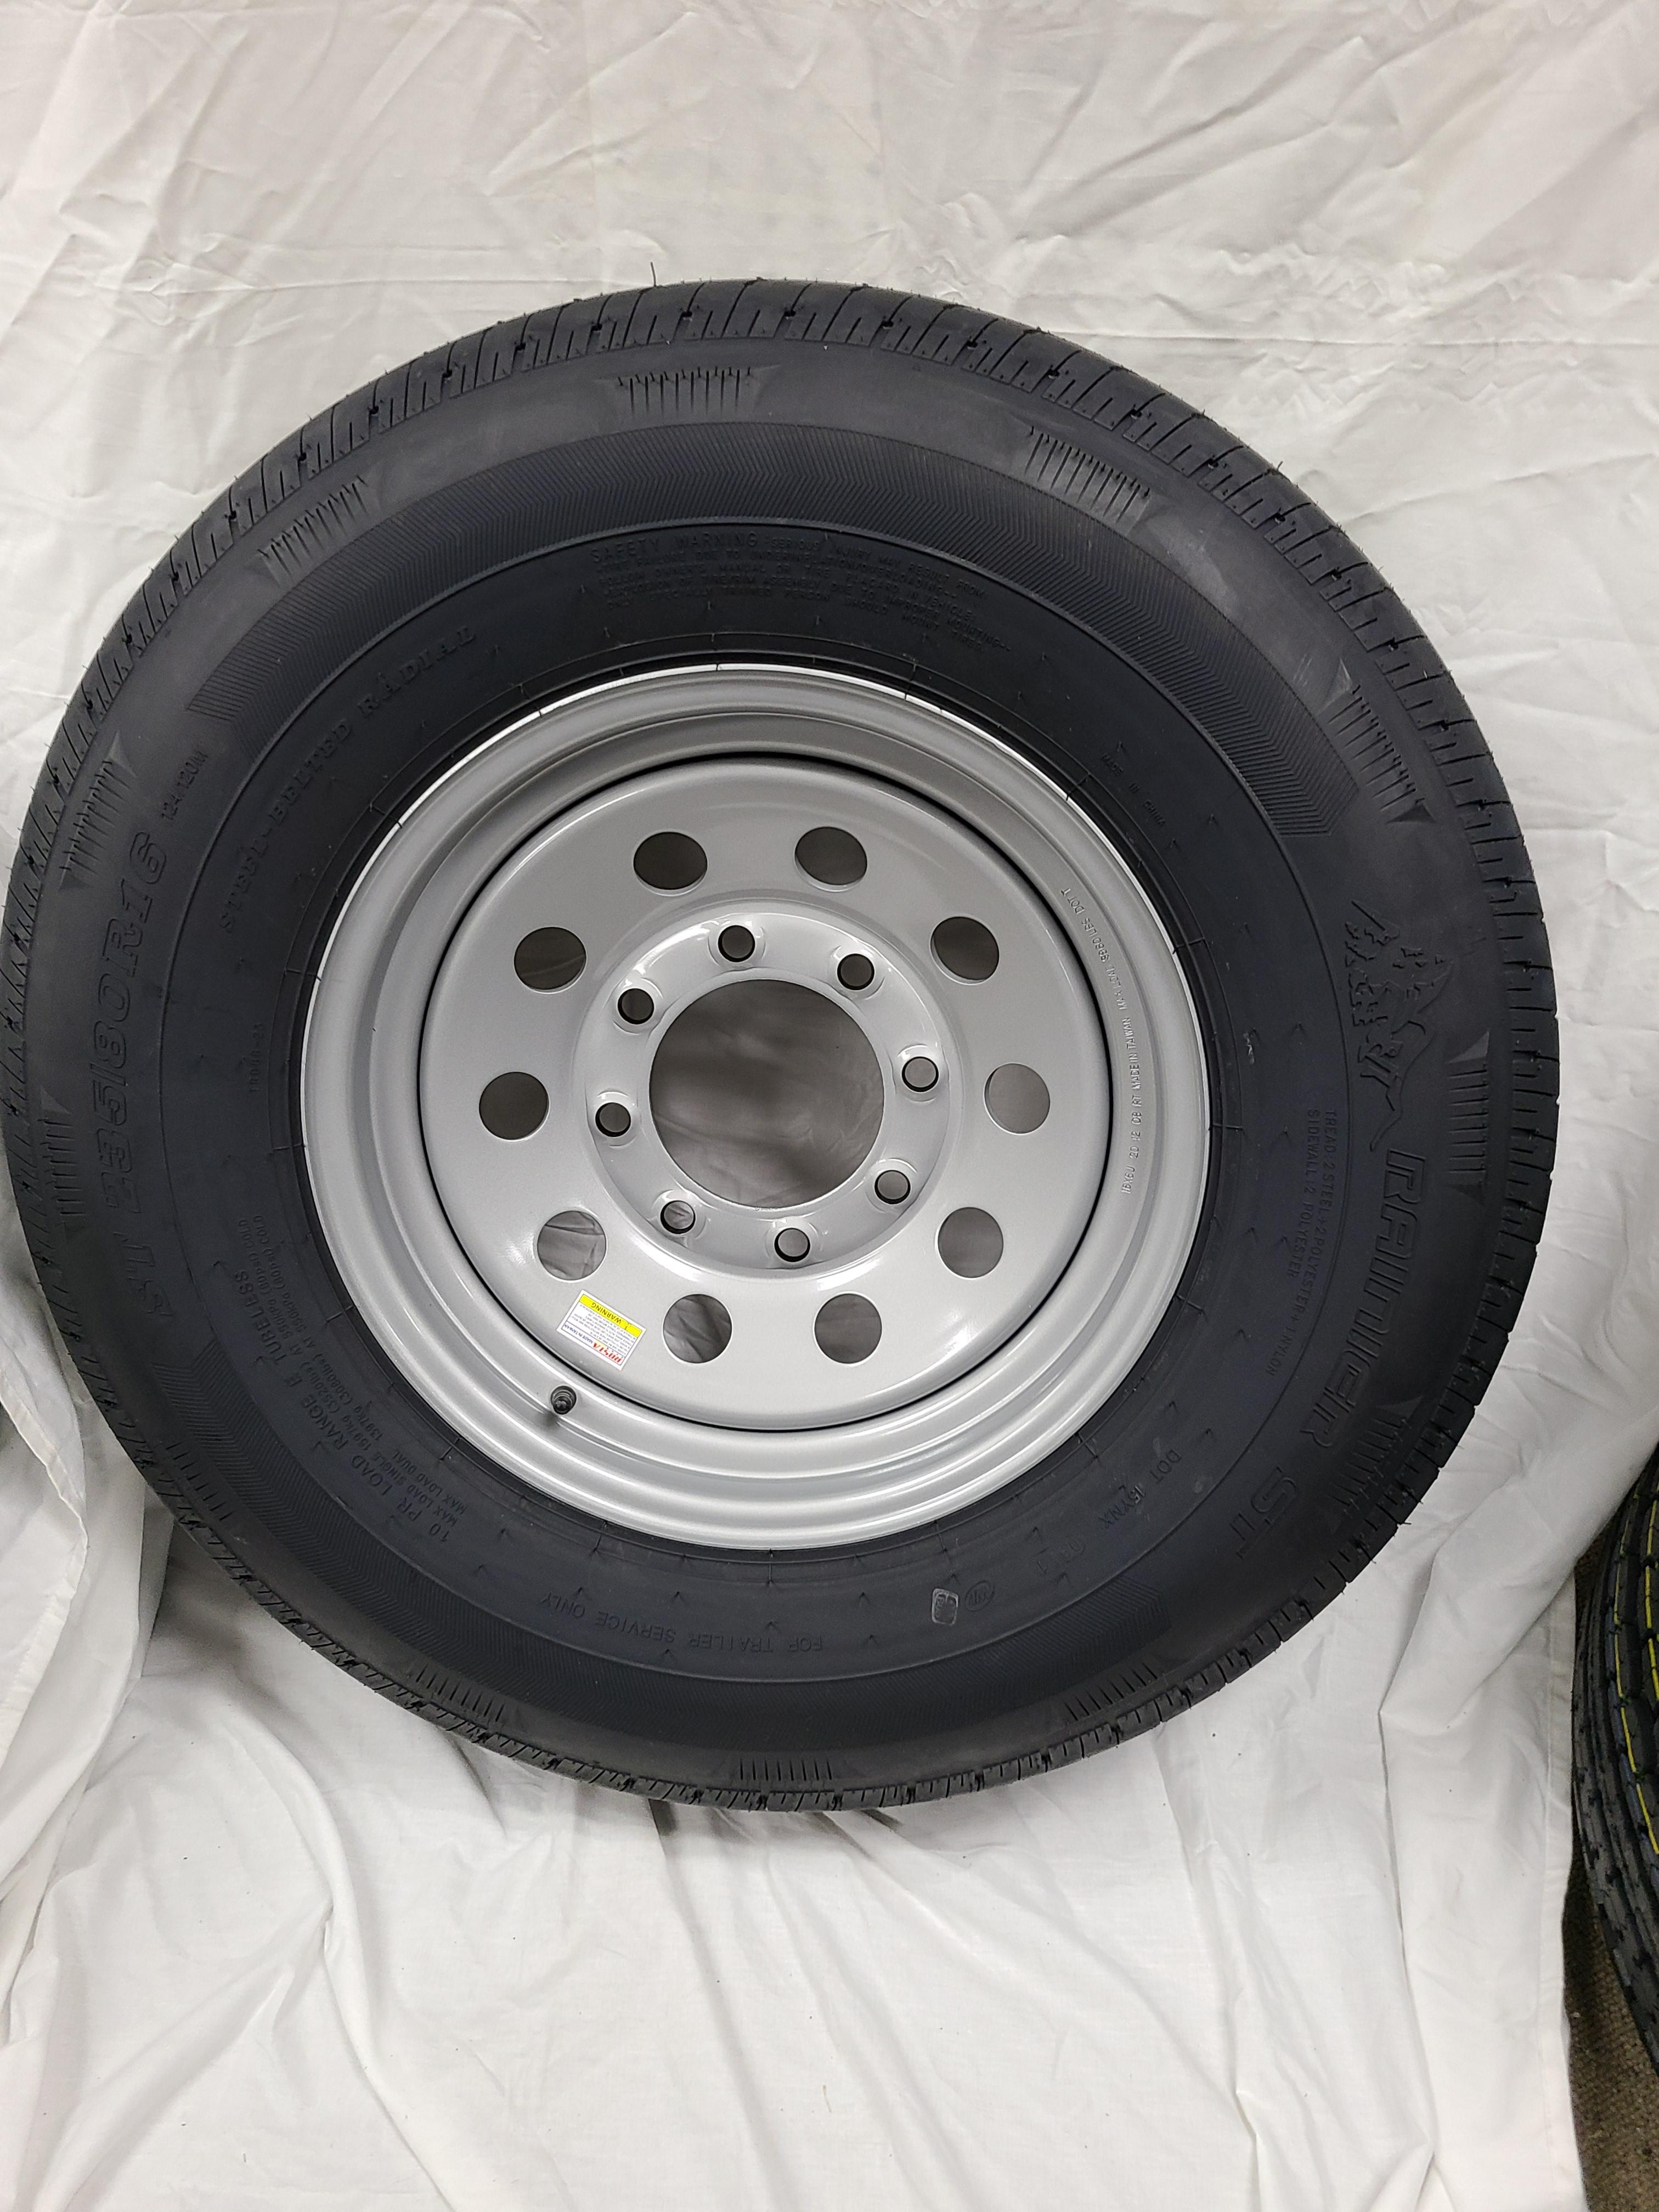 ST235/80/R16 Load Range E 8 Hole Silver Mod